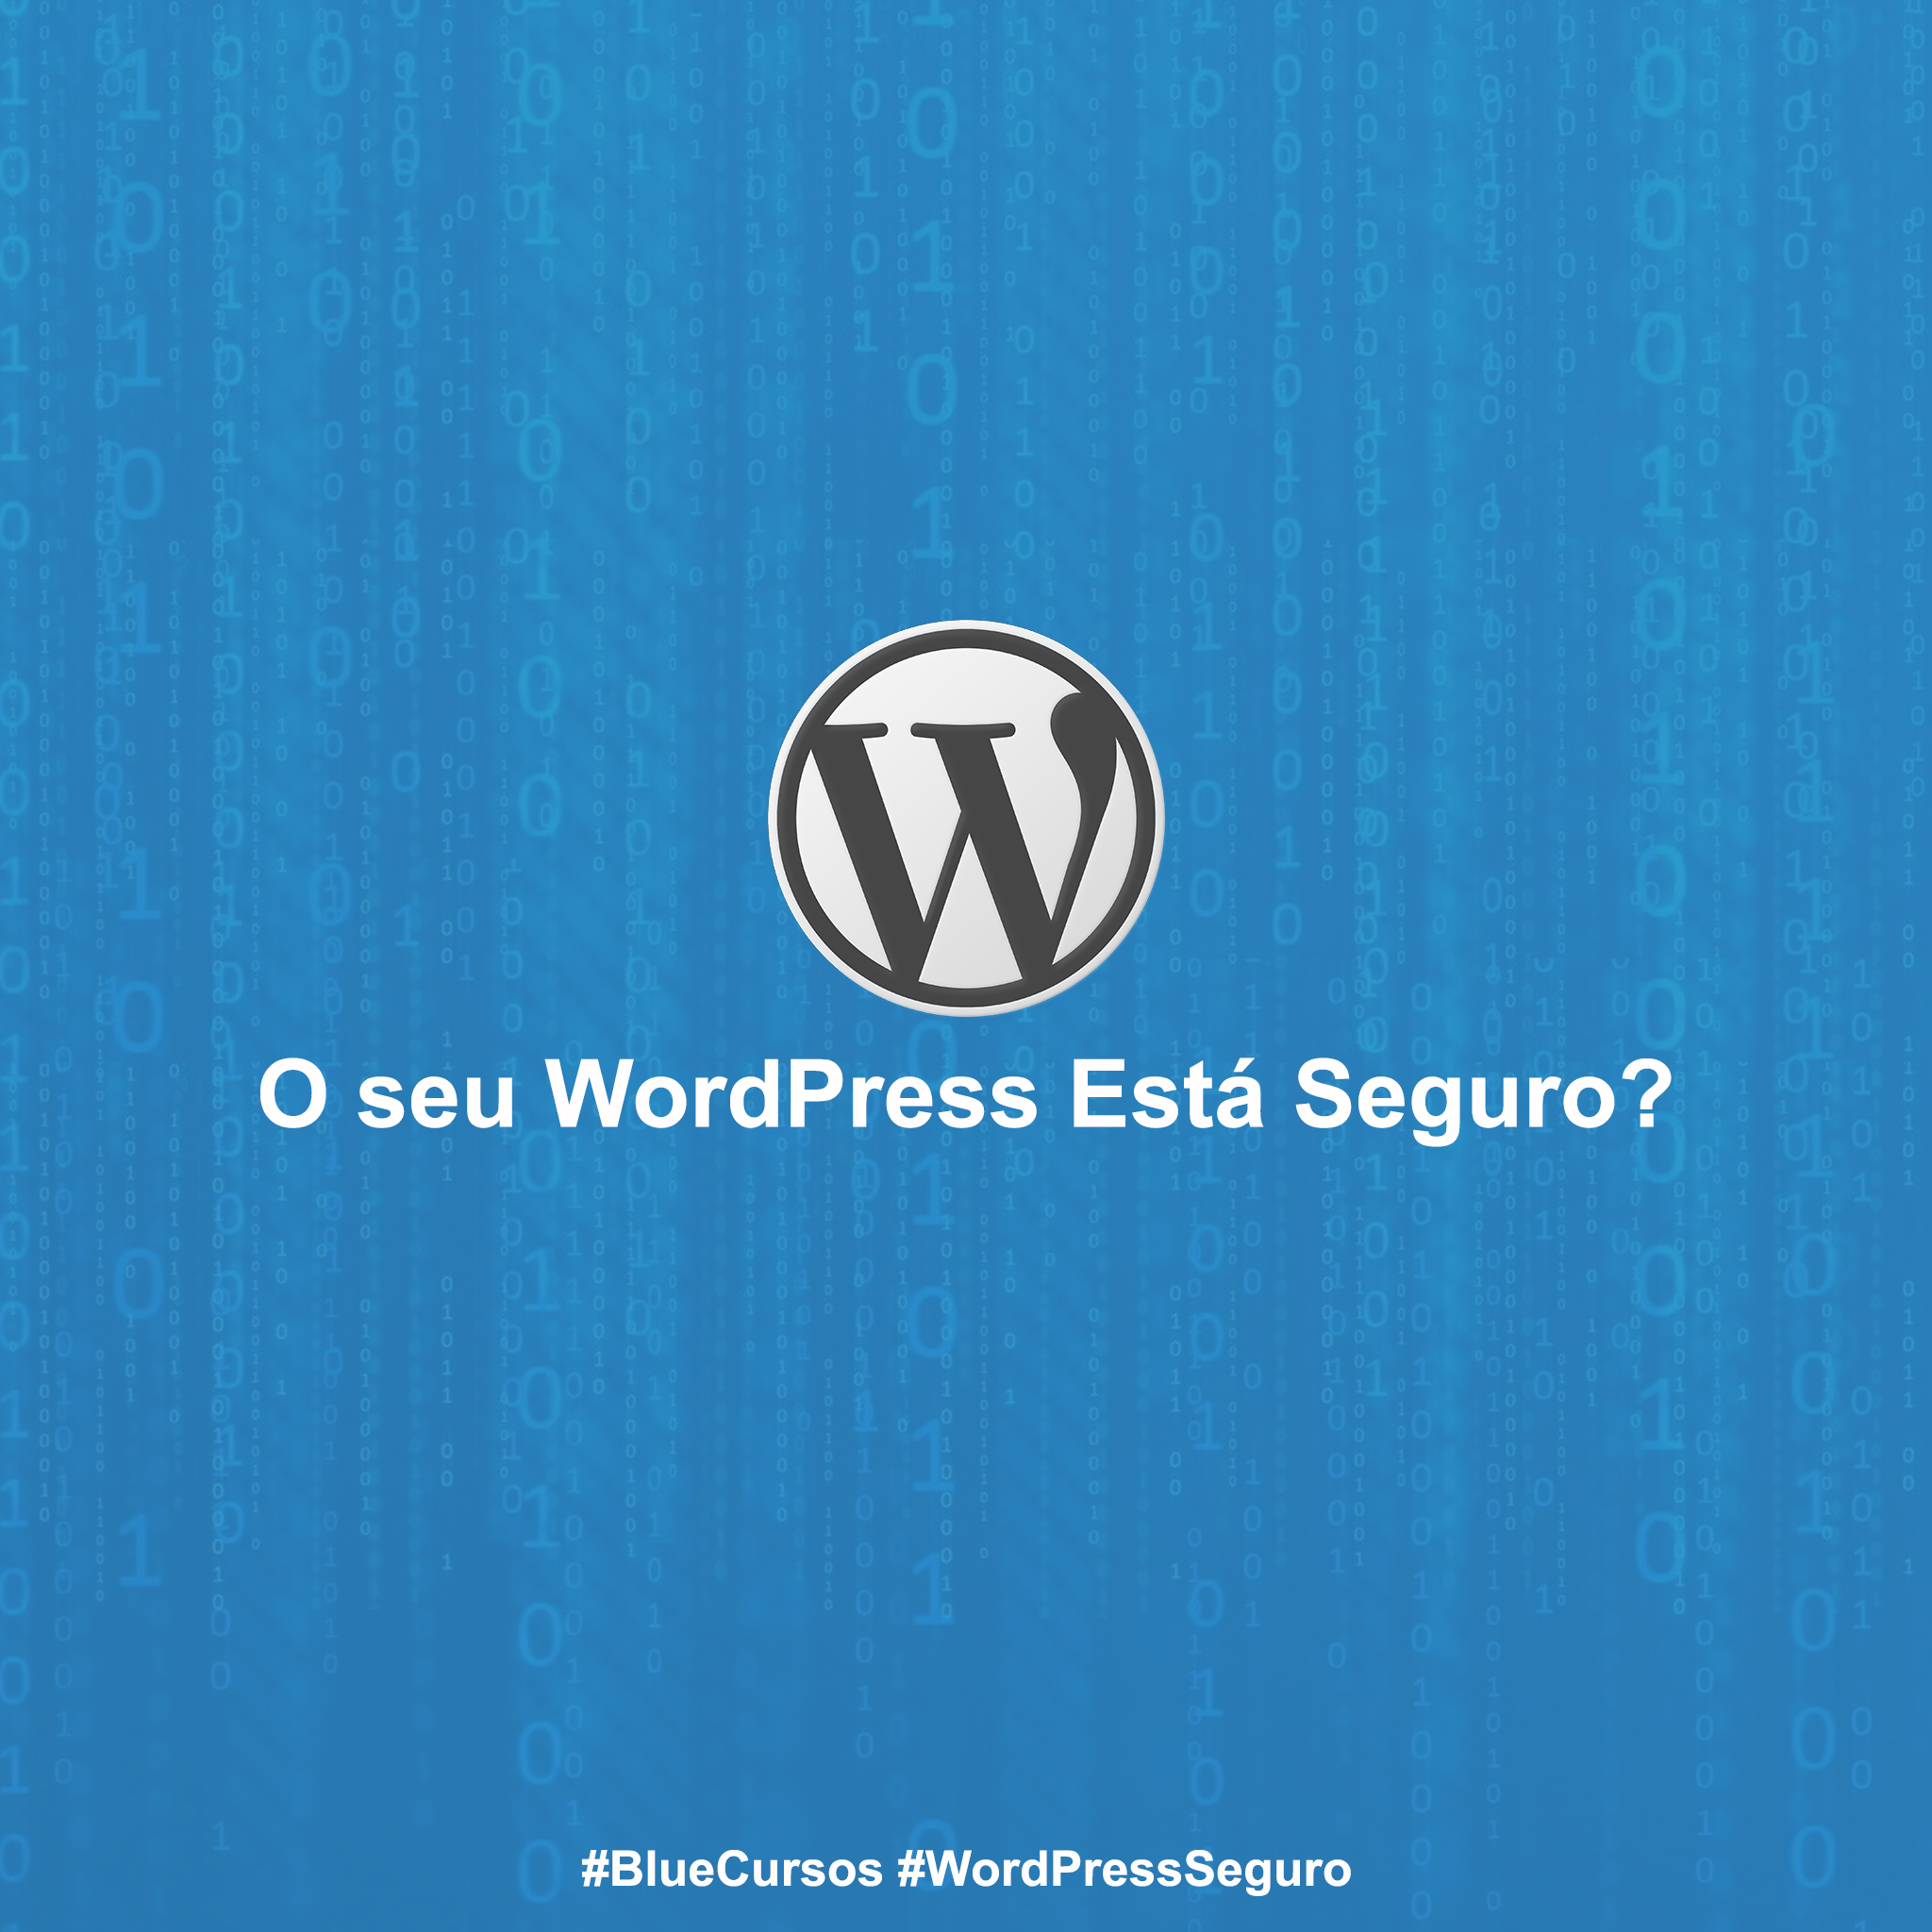 WordPress Seguro - Treinamento de Segurança em WordPress